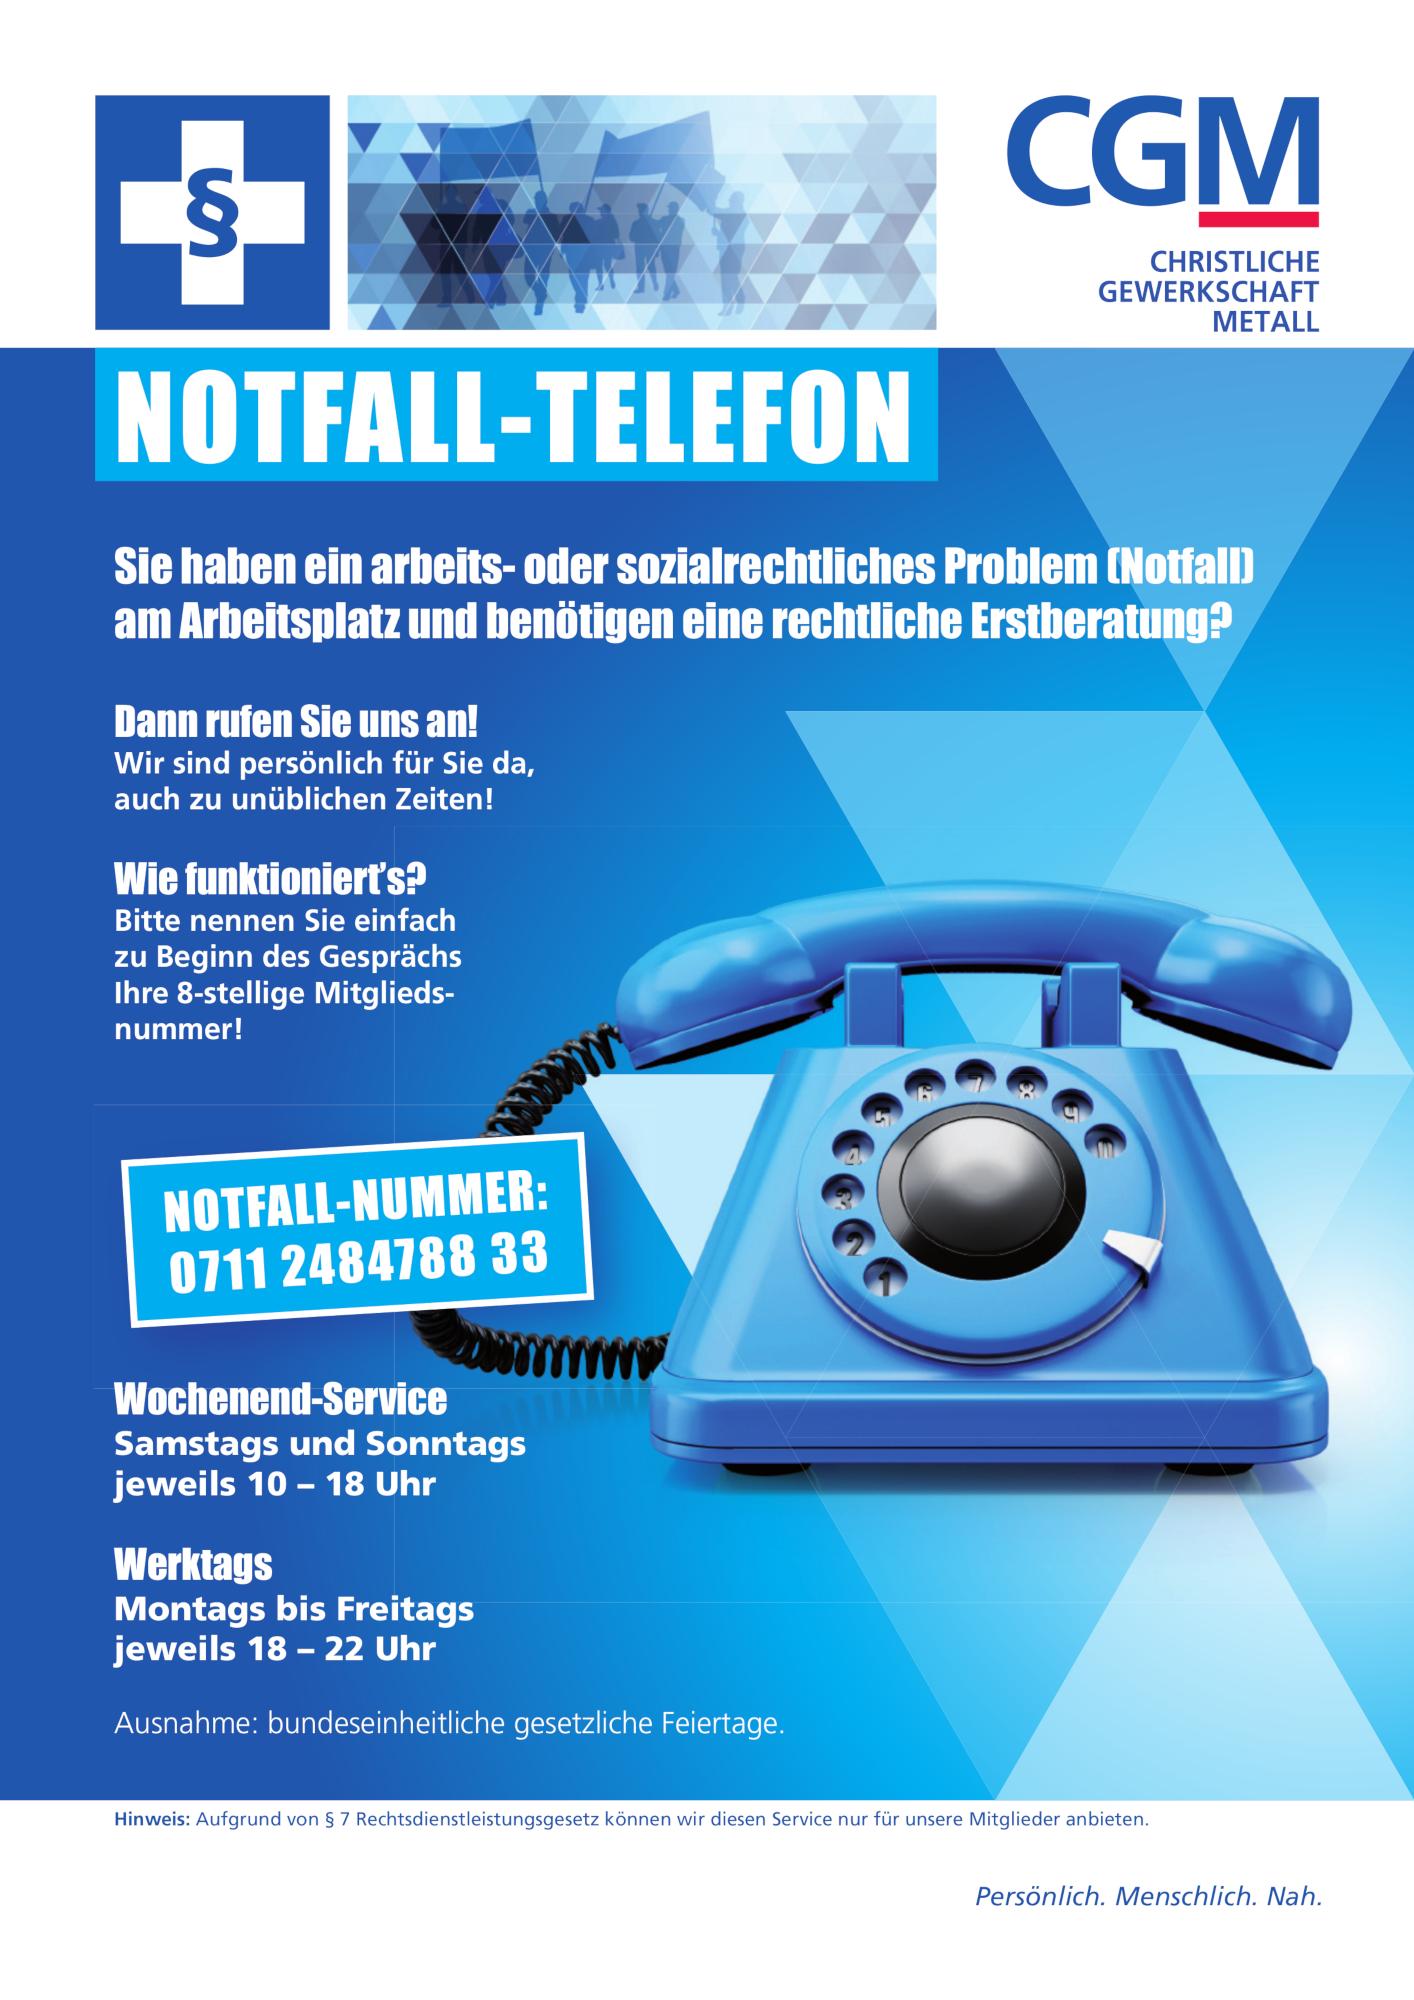 CGM_Notfalltelefon_Plakat_A4_v2